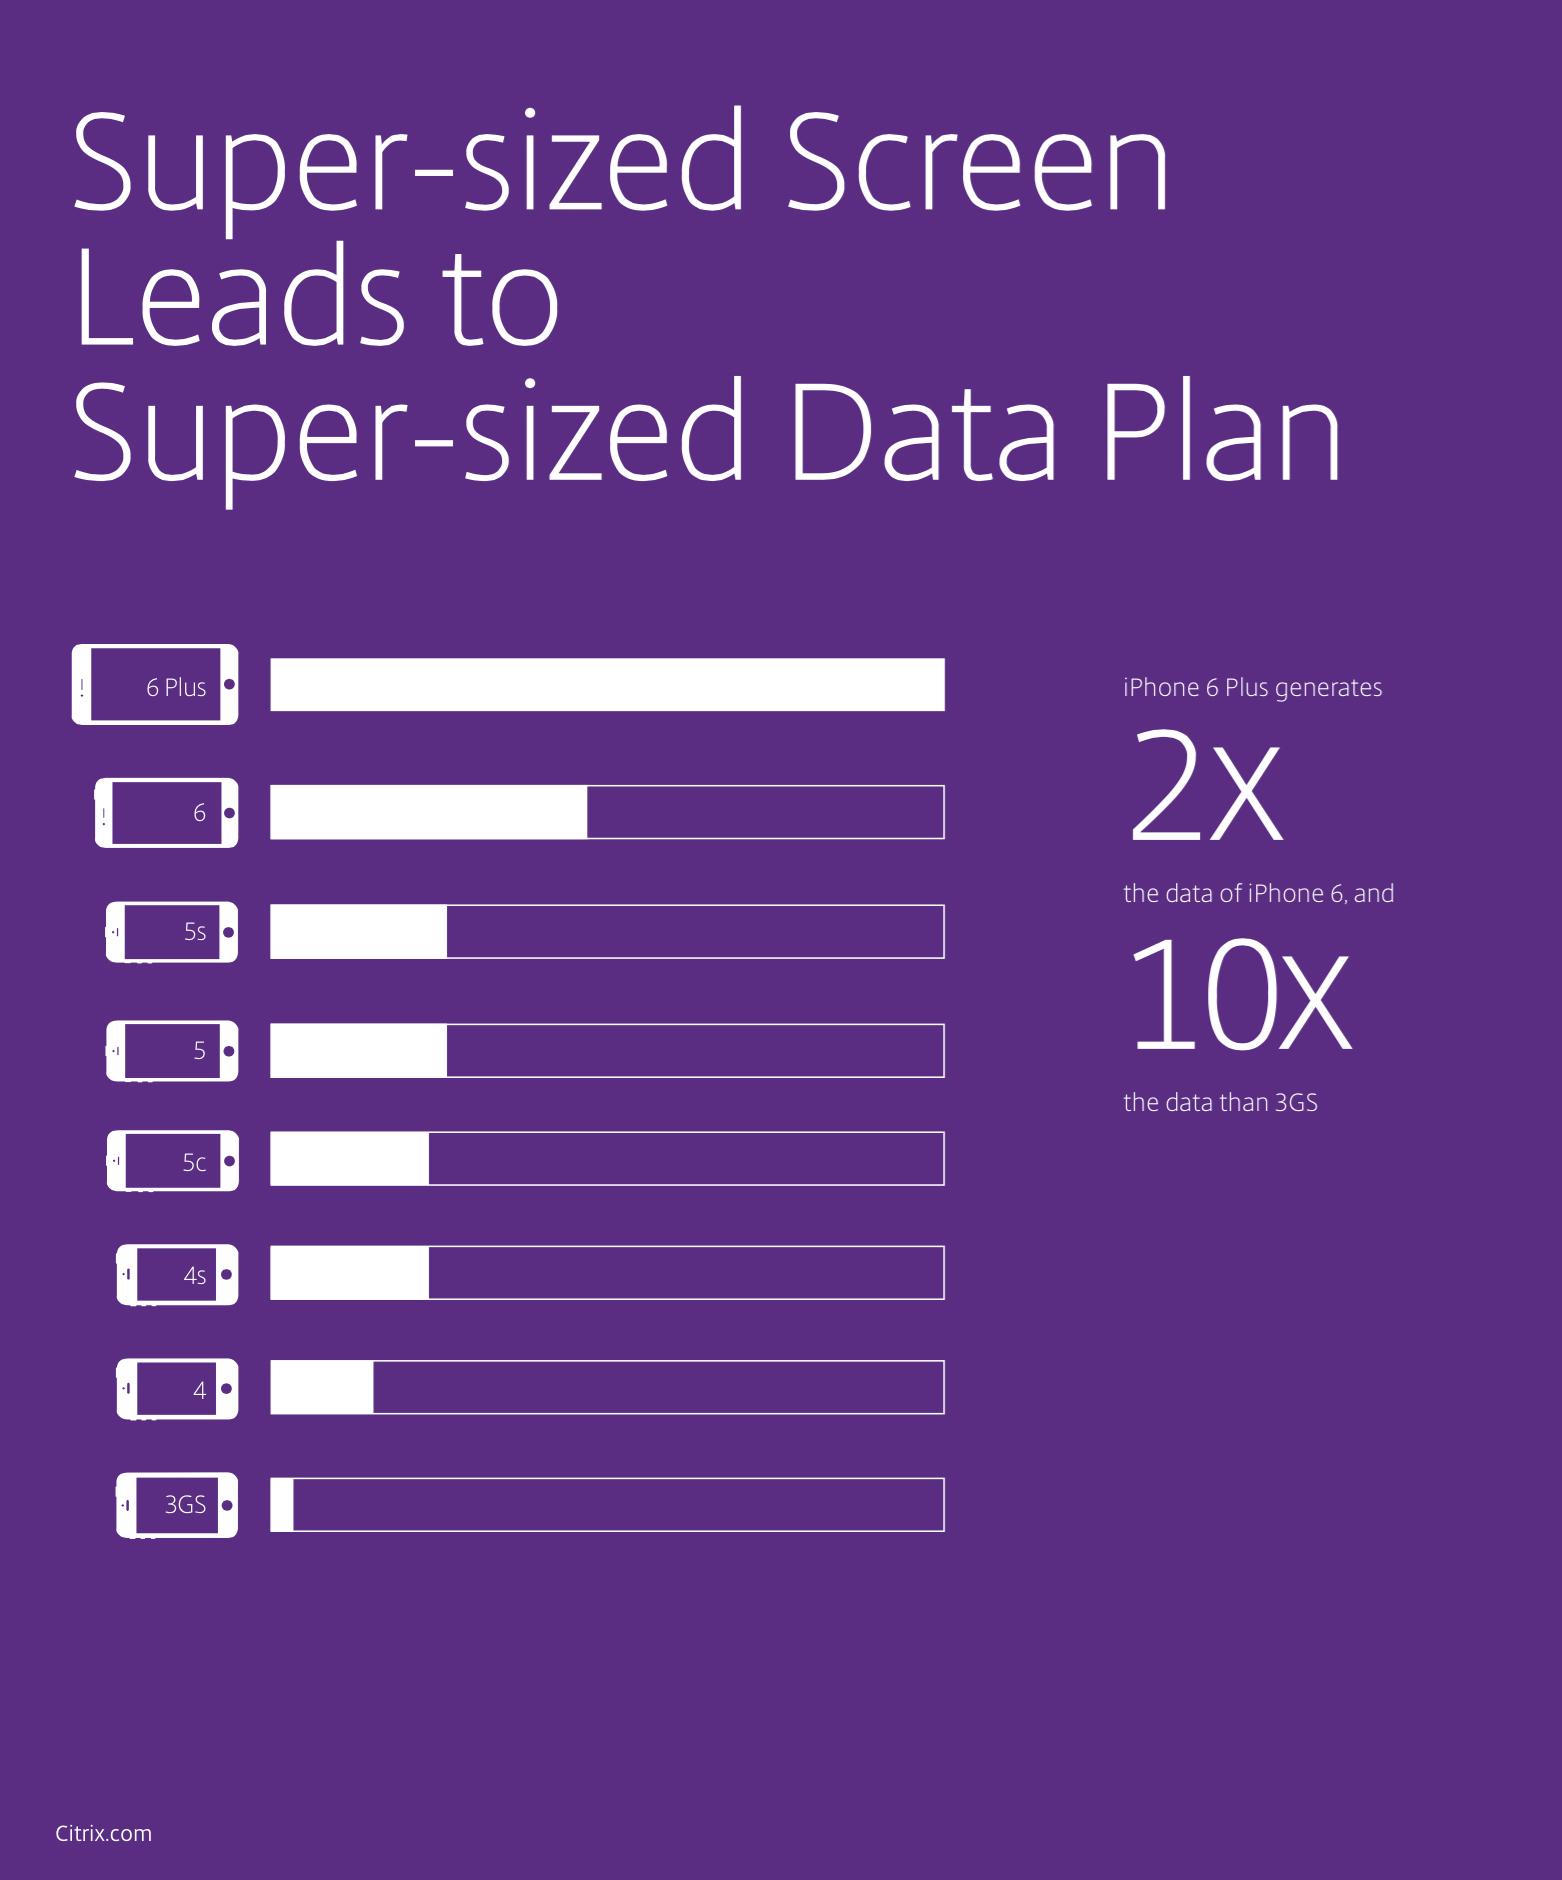 Consumo de dados por iPhones 6 e 6 Plus